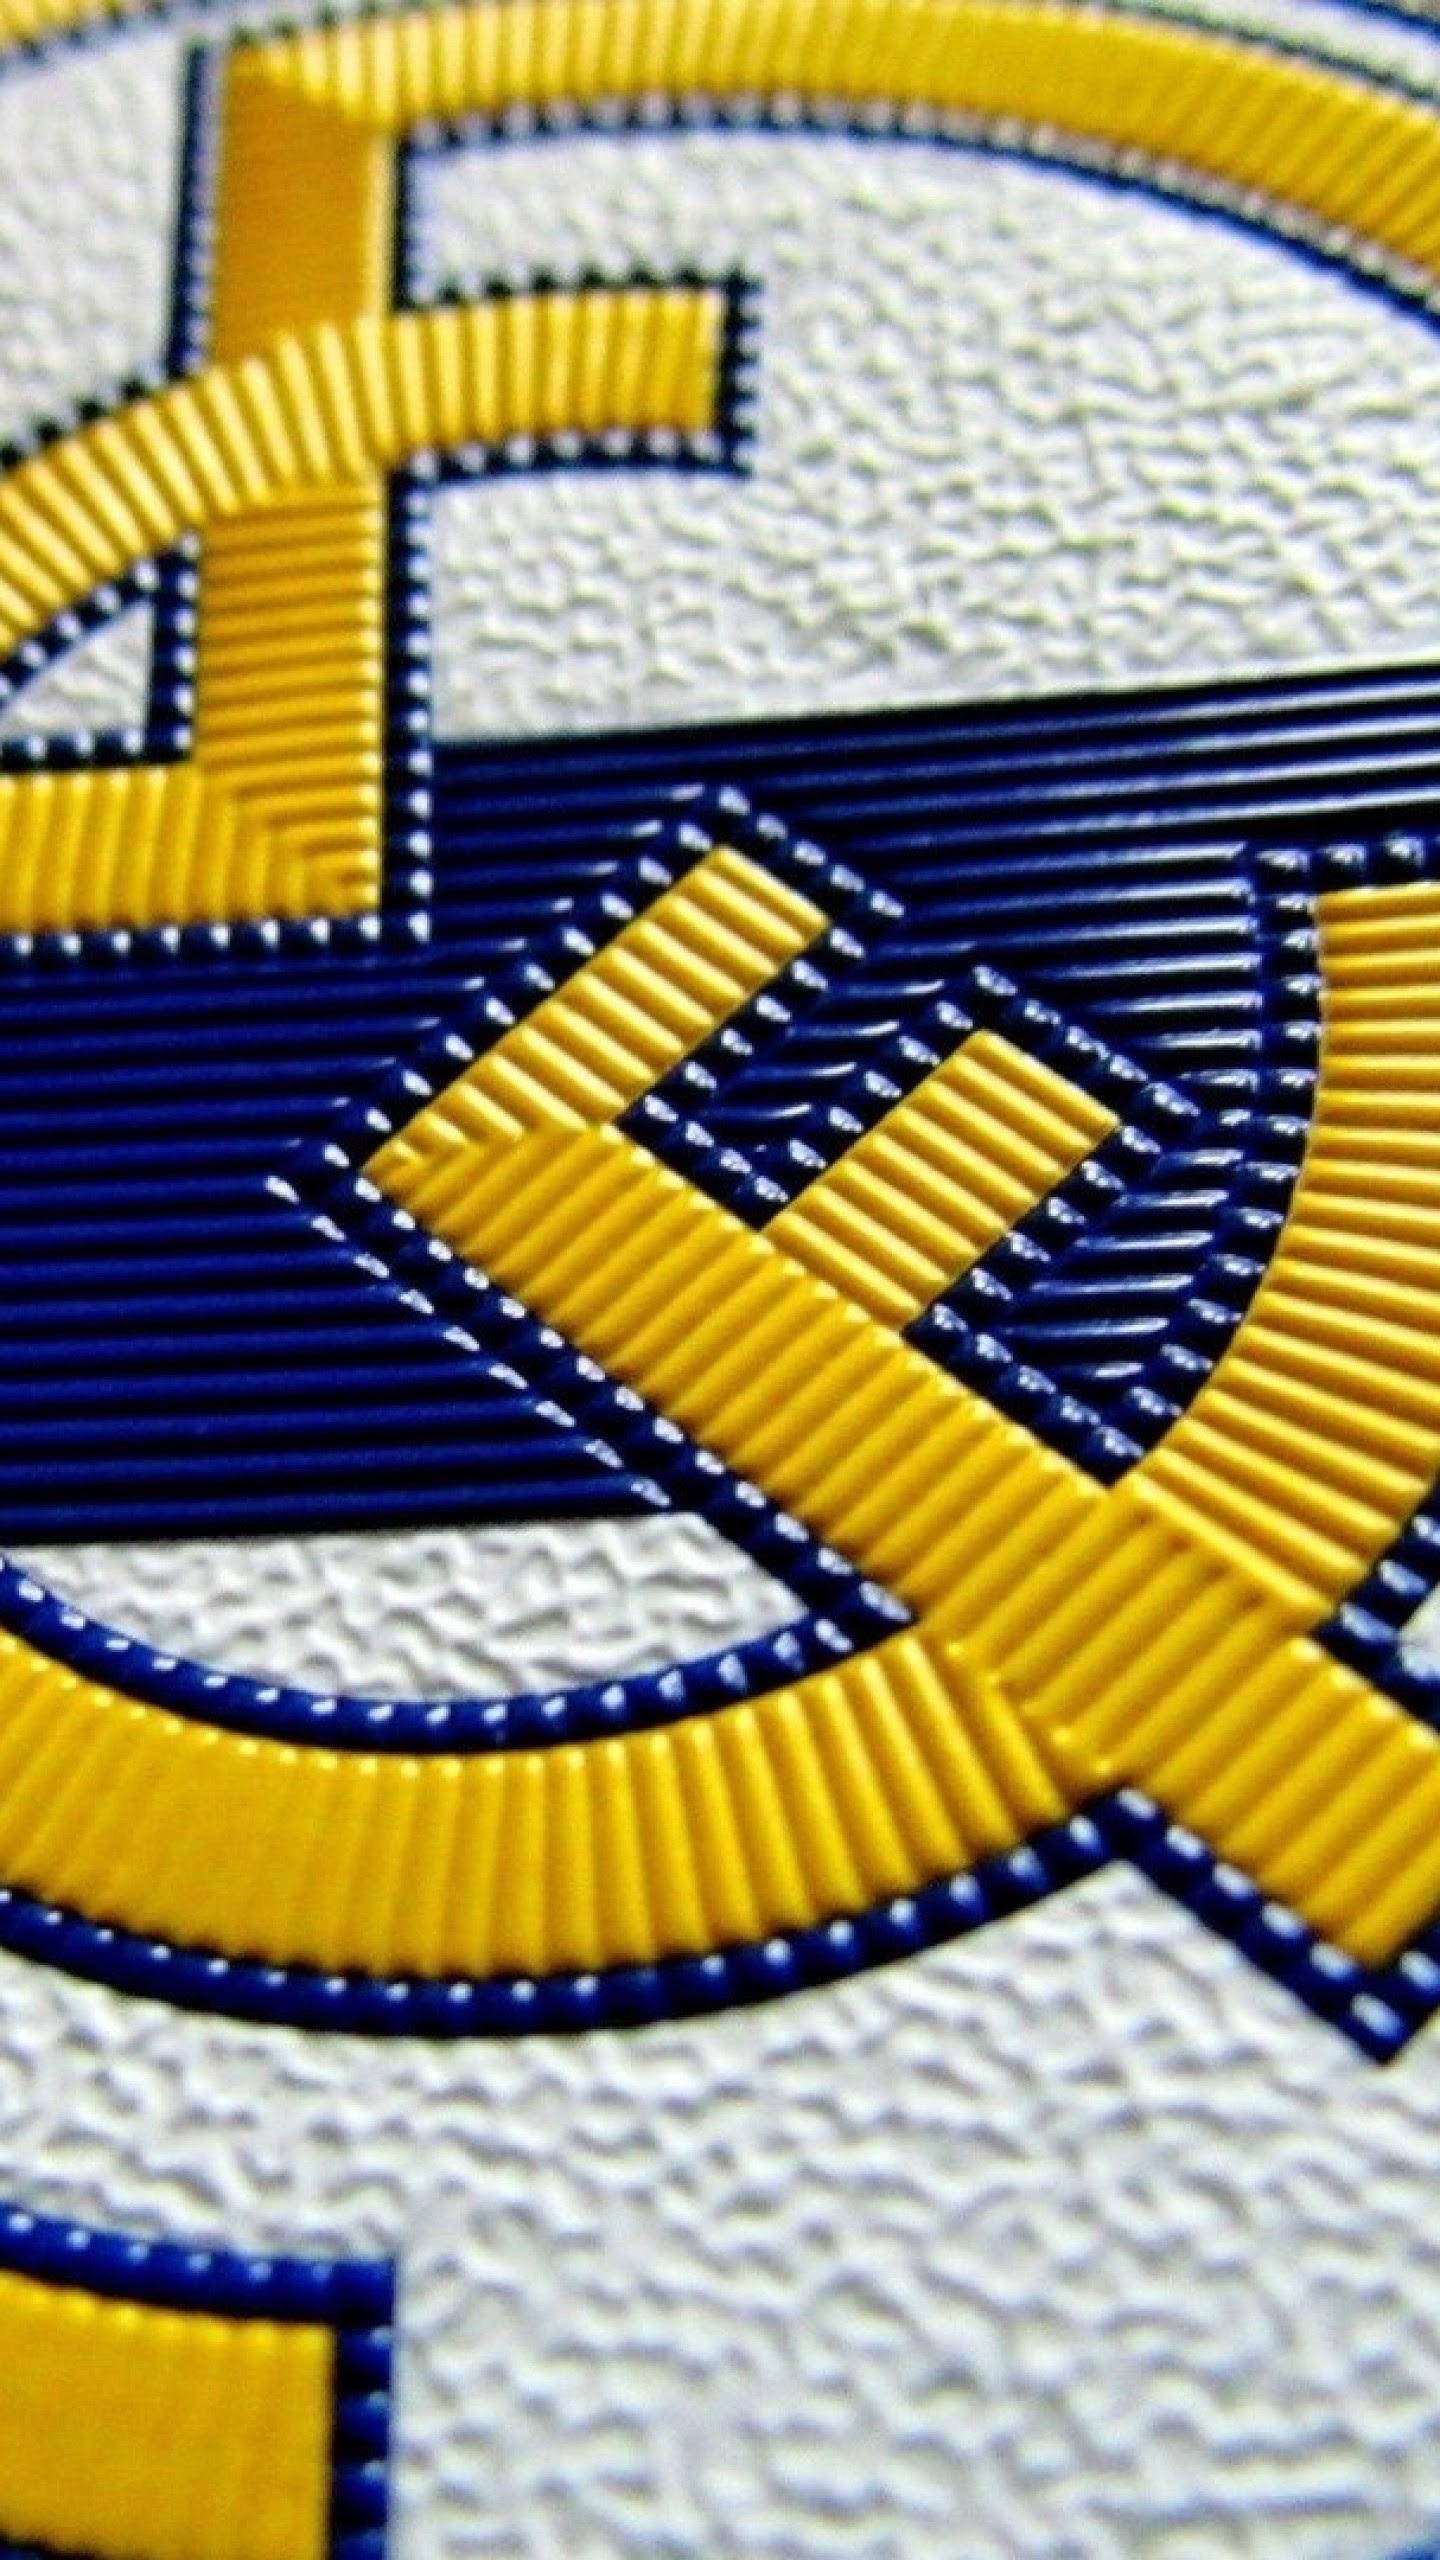 Real Madrid Wallpaper Iphone Xr Hd Football